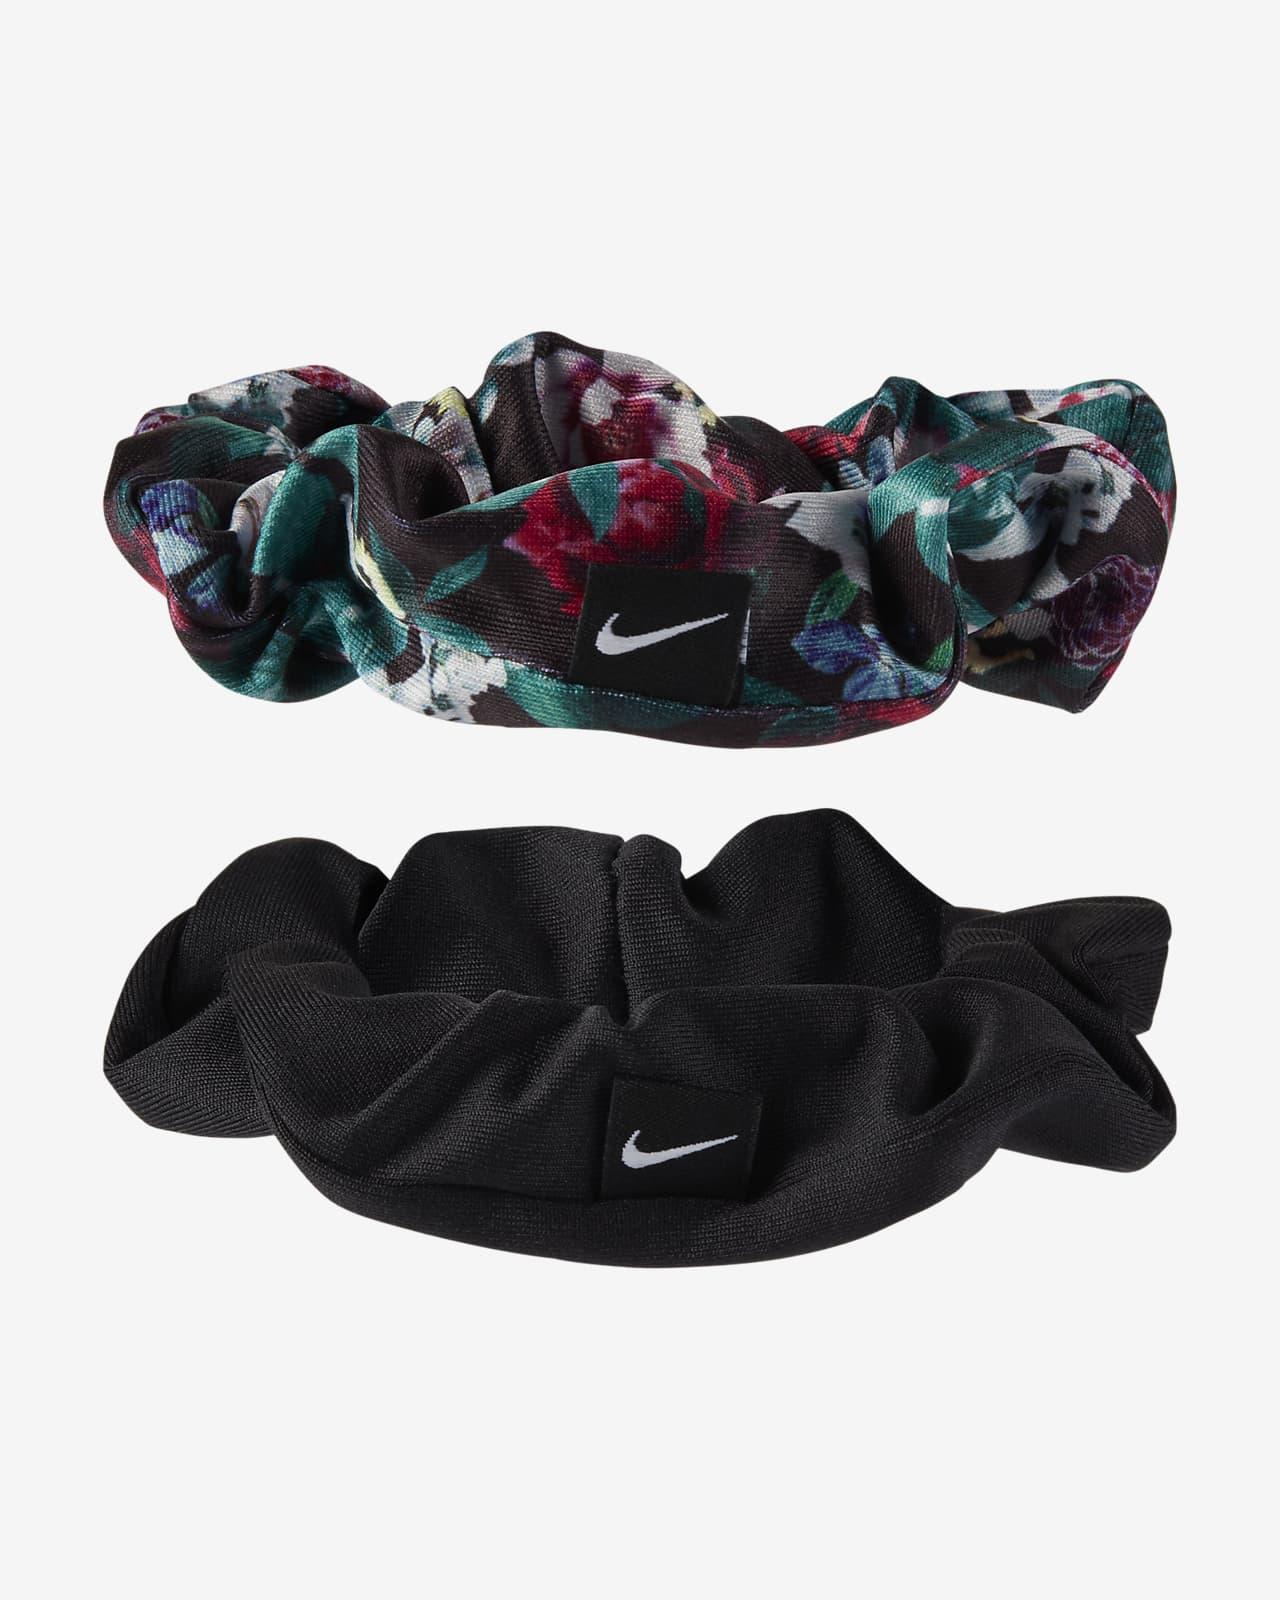 Nike Gathered Hairbands (2-Pack)